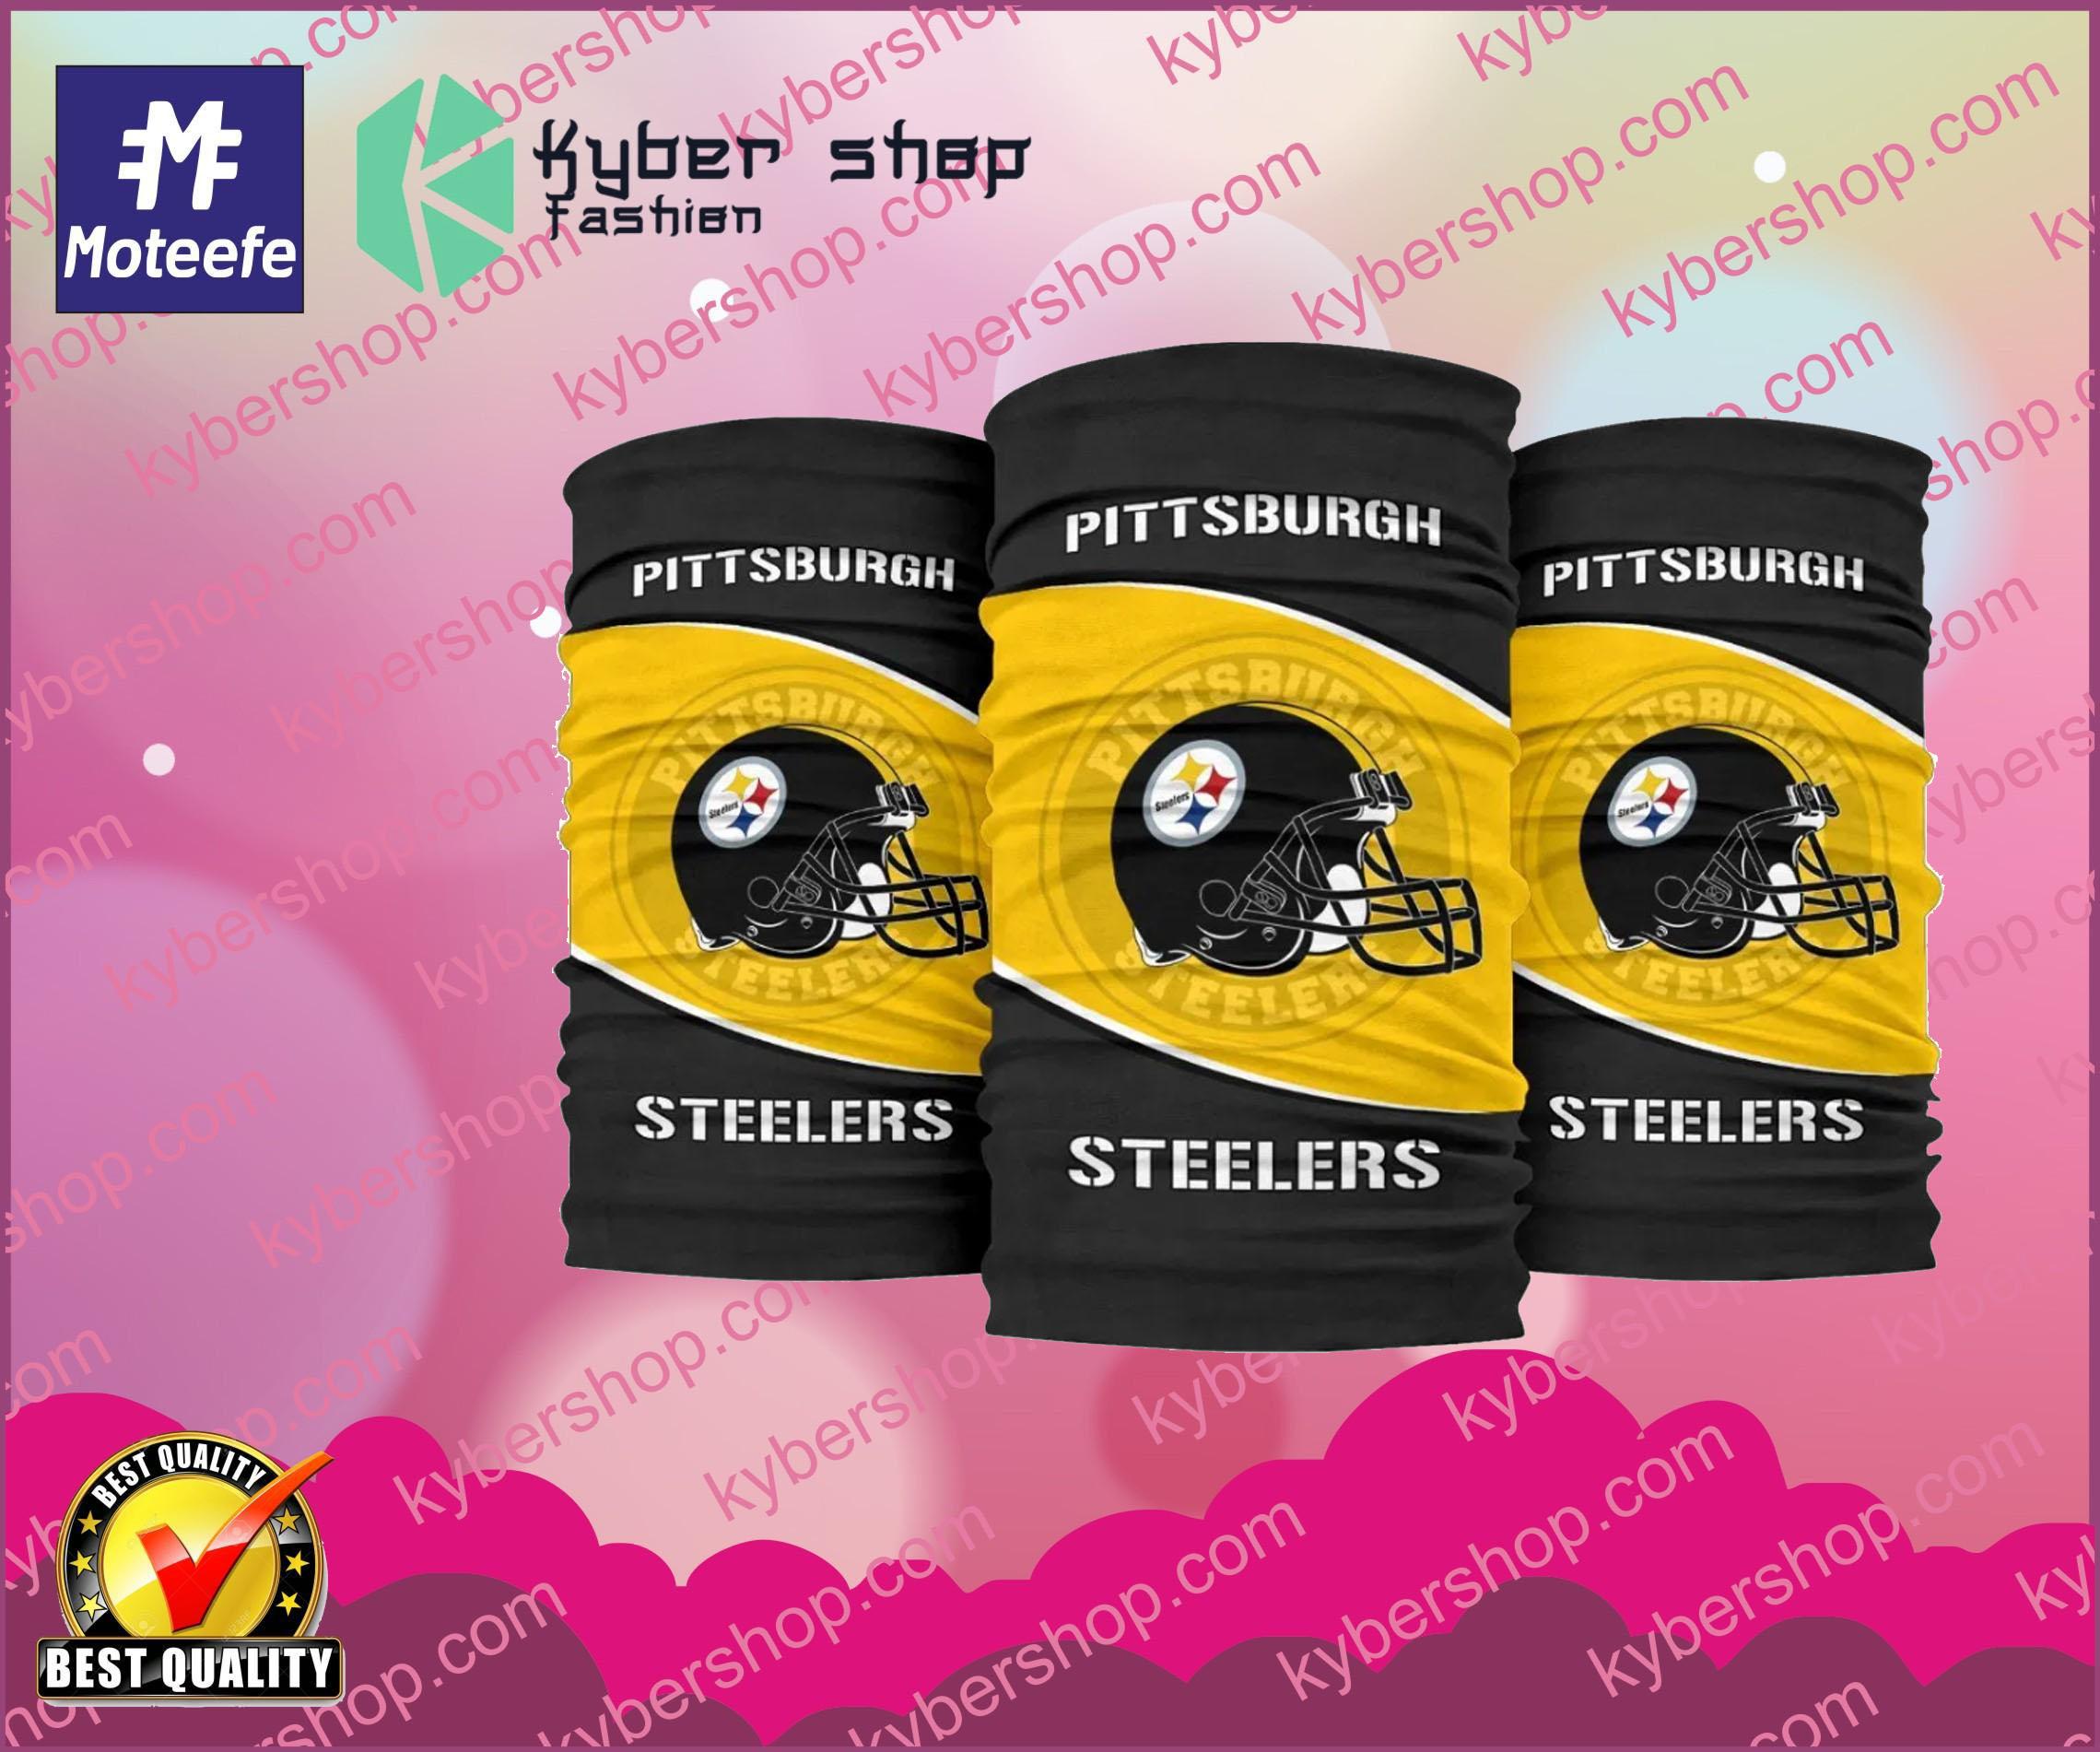 Pittsburgh steelers bandana